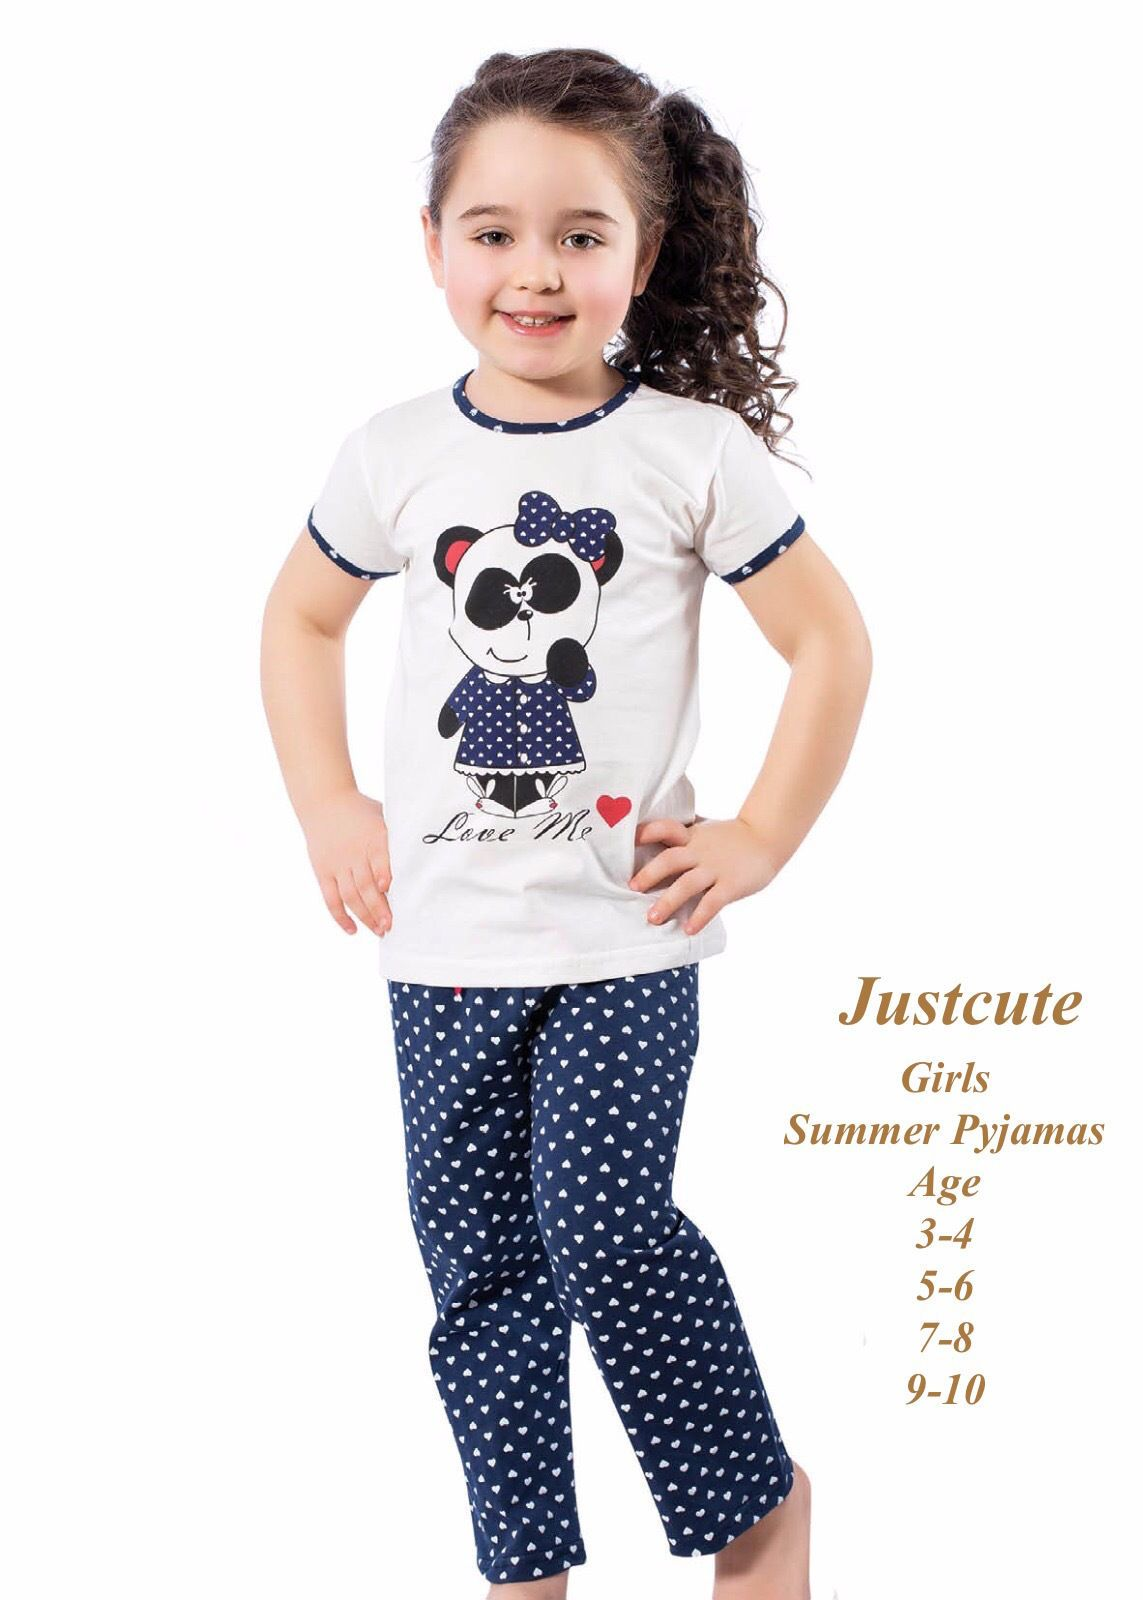 771d719c561 Girl s Summer Pyjamas Love Me Heart Bear 93% Cotton Pjs 3 To 10 Years